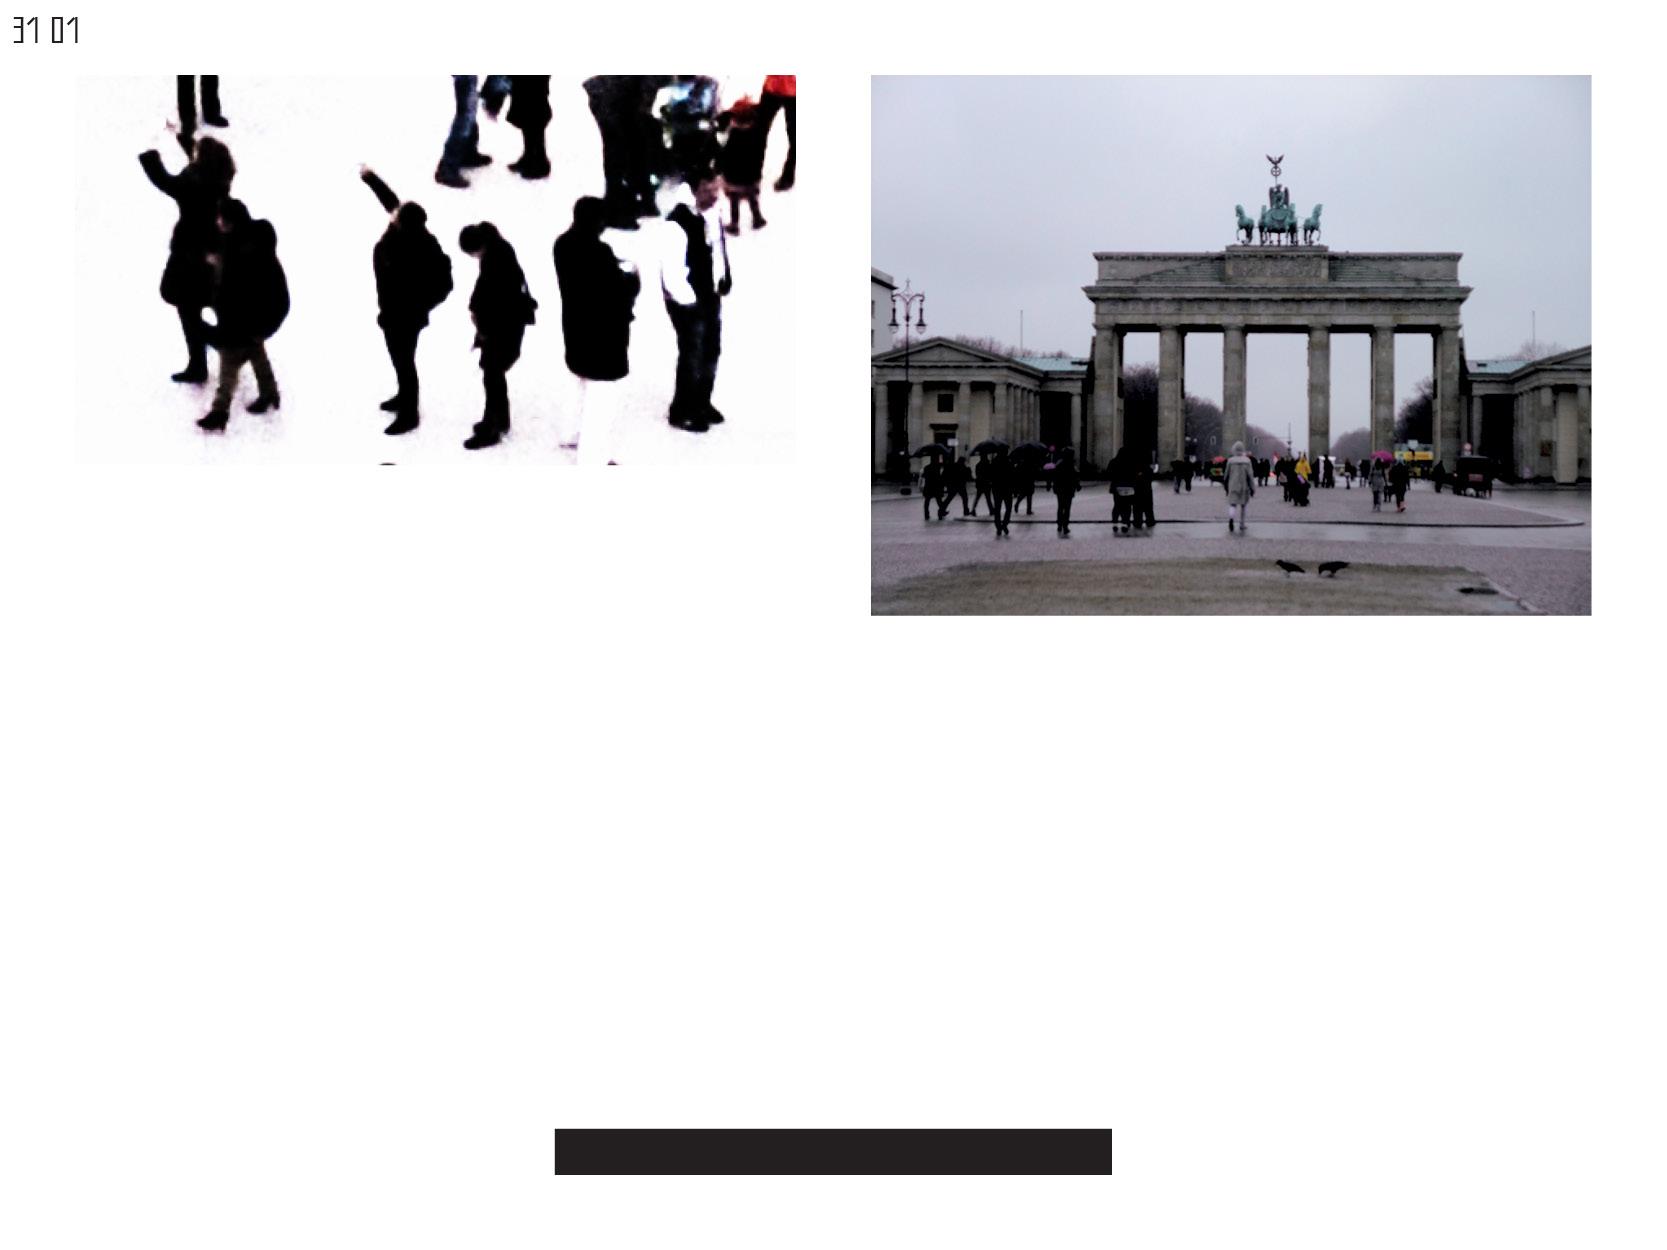 Gerrit-Schweiger-Dialog-Städte-Paris-Berlin-Jessica-Blank-Experiment-Fotoserie-Tagebuch-visuelle-Kommunikation-91